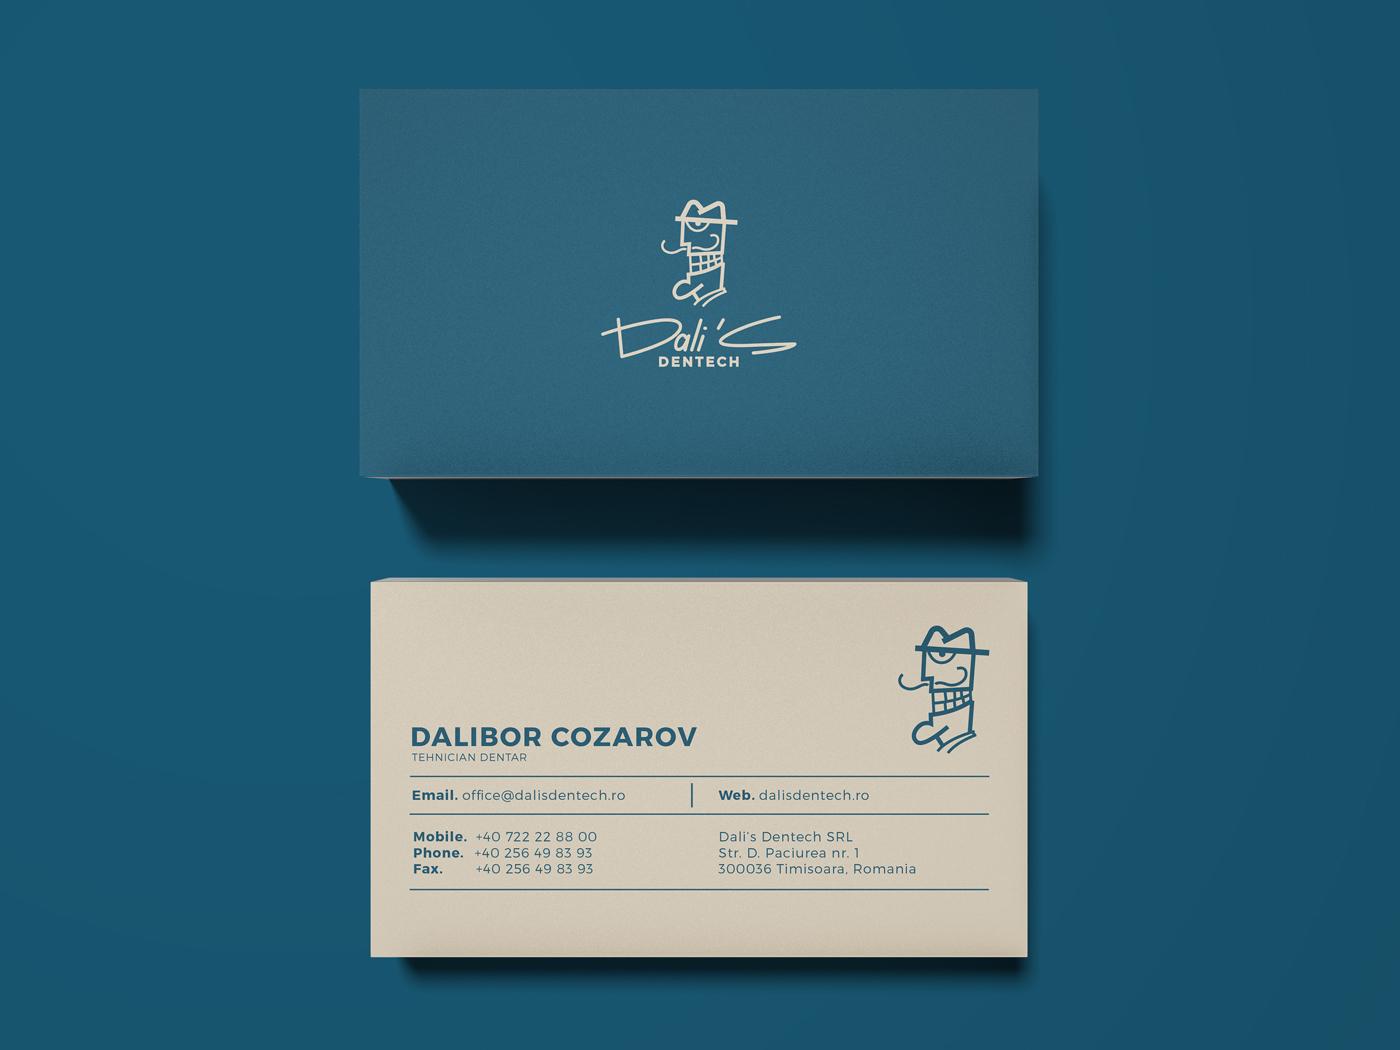 Dali's Dentech Business Card Design cartoon character panter modern business card design tech dentistry dentist stomatology smiley face smile navy blue business card lux minimal luxury logo design identity logo branding panter vision